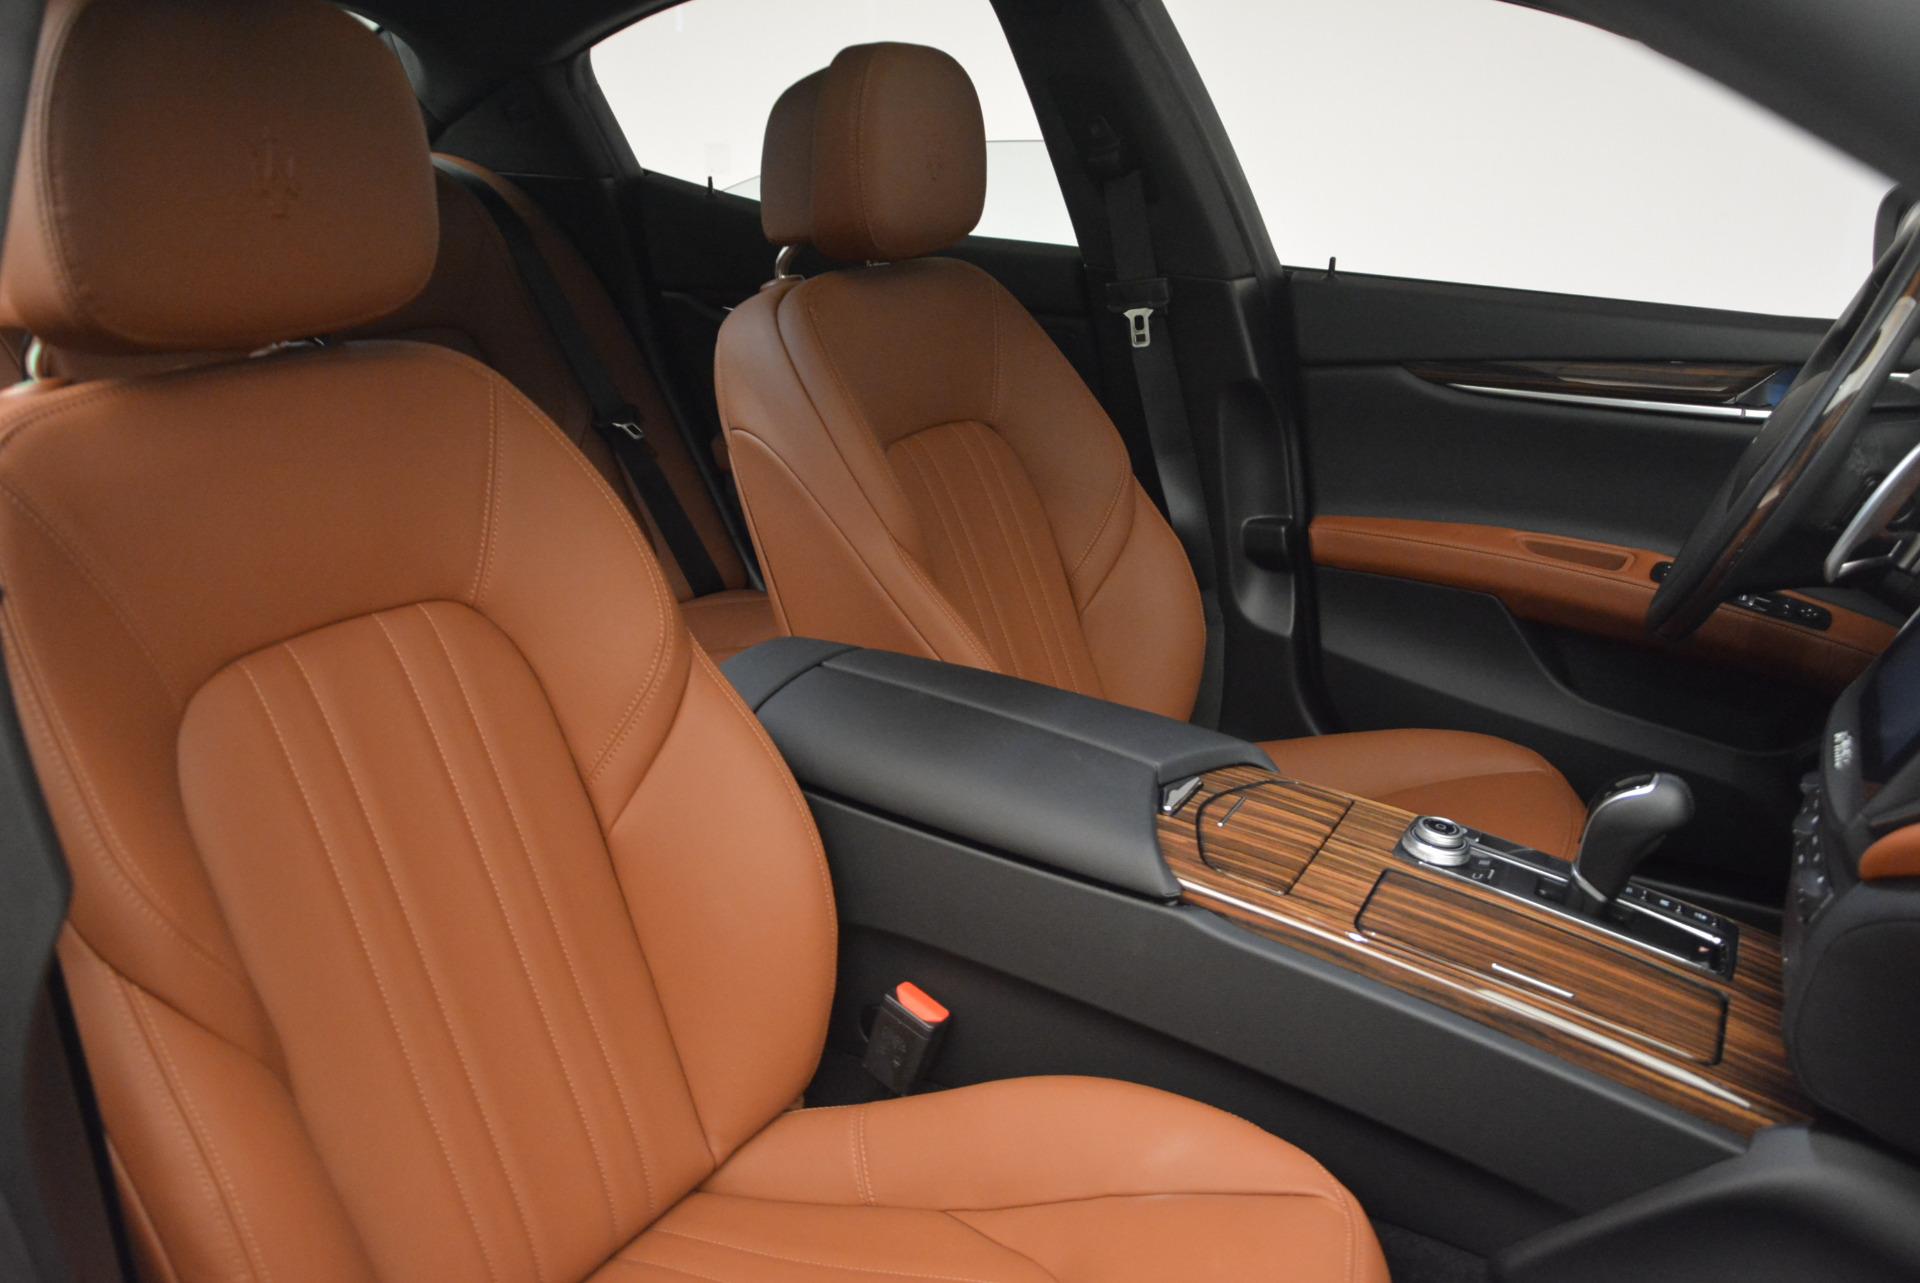 Used 2017 Maserati Ghibli S Q4  EX-LOANER For Sale In Westport, CT 565_p21